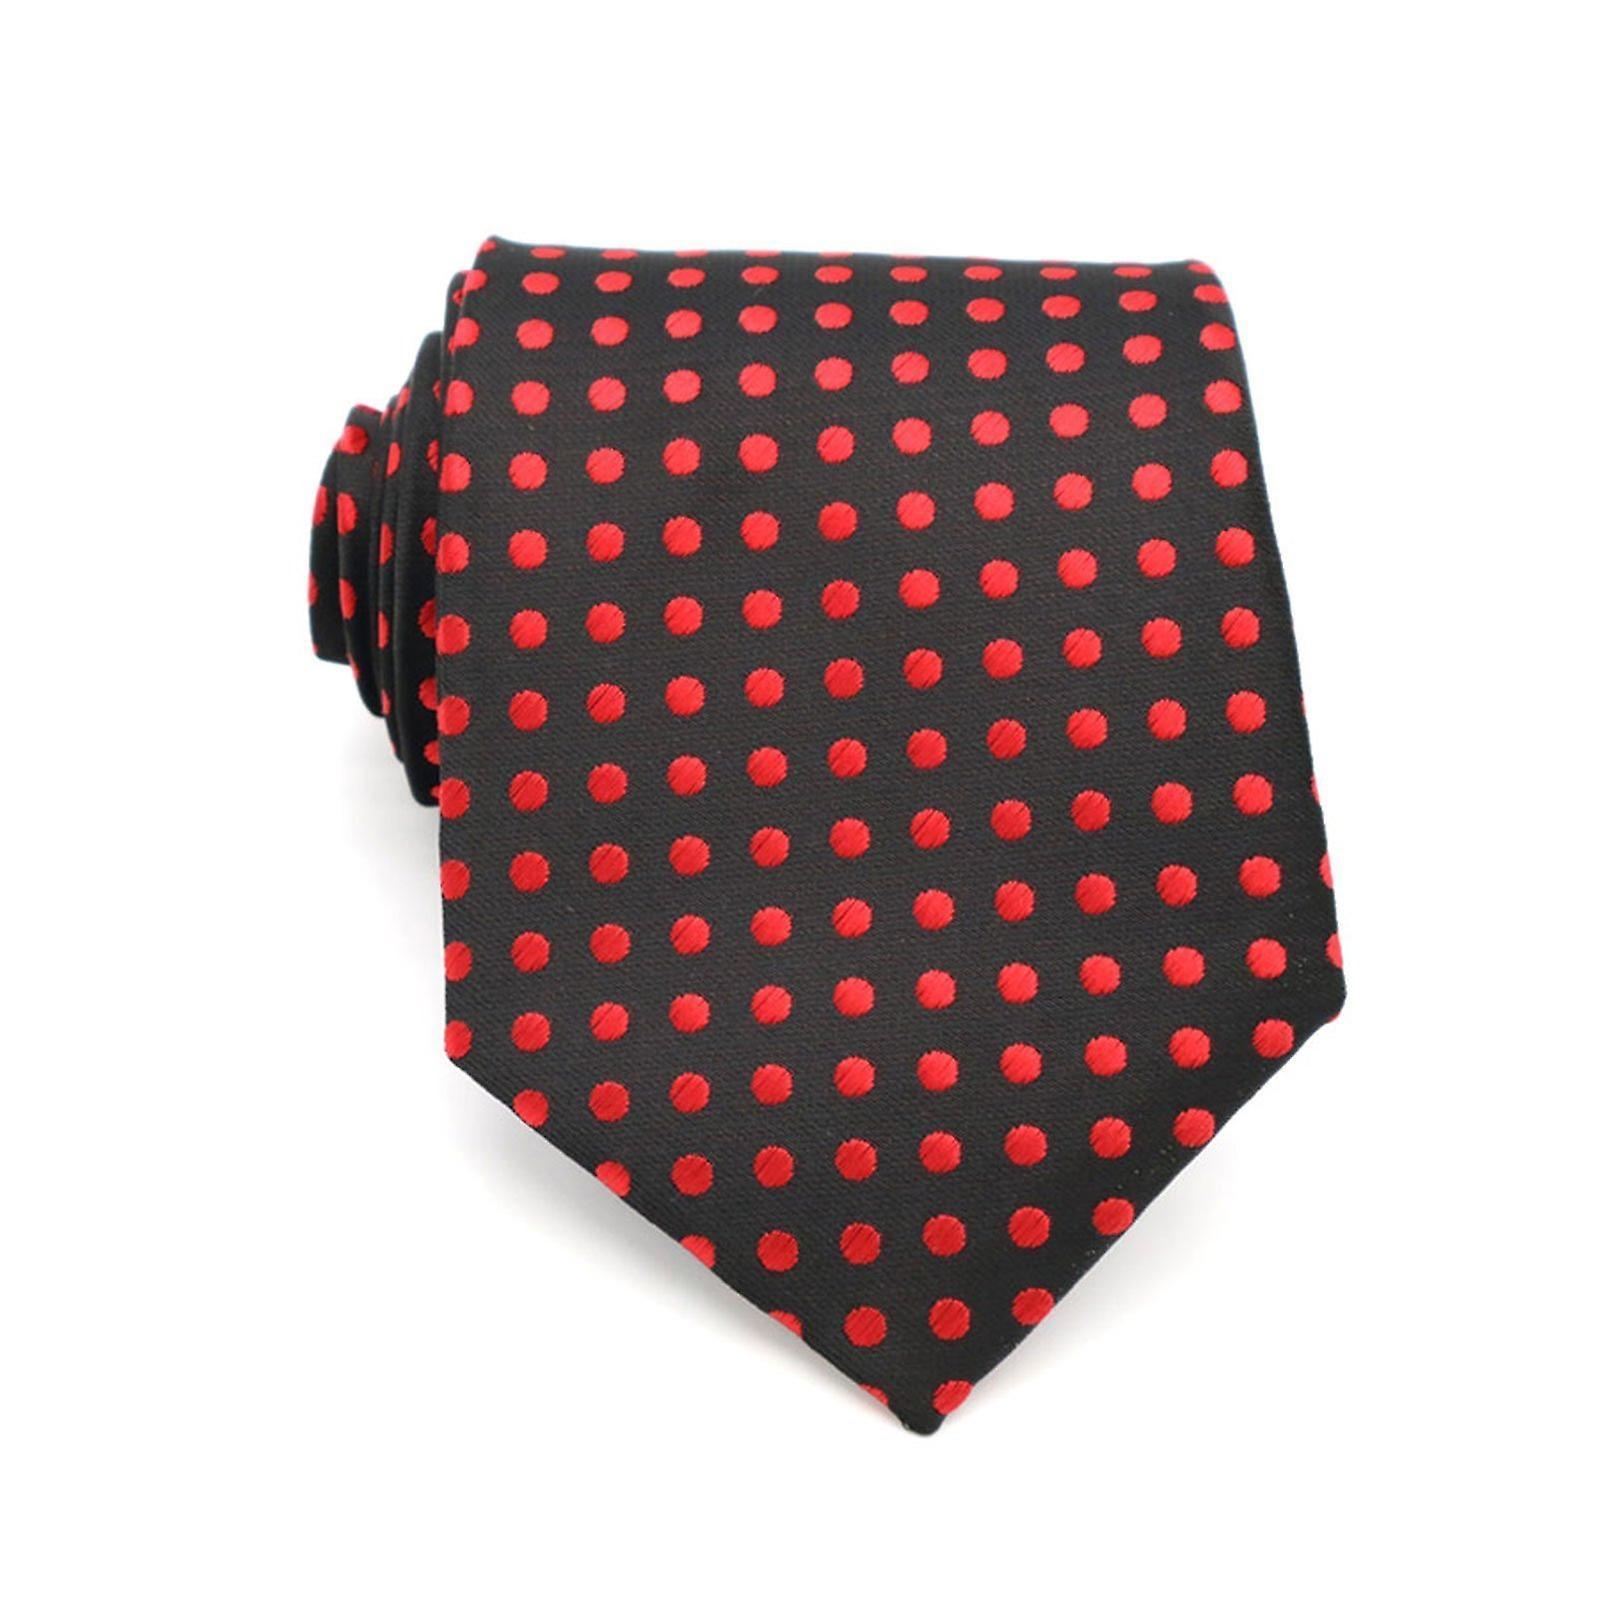 Red & black polka dot detail tie & pocket square set